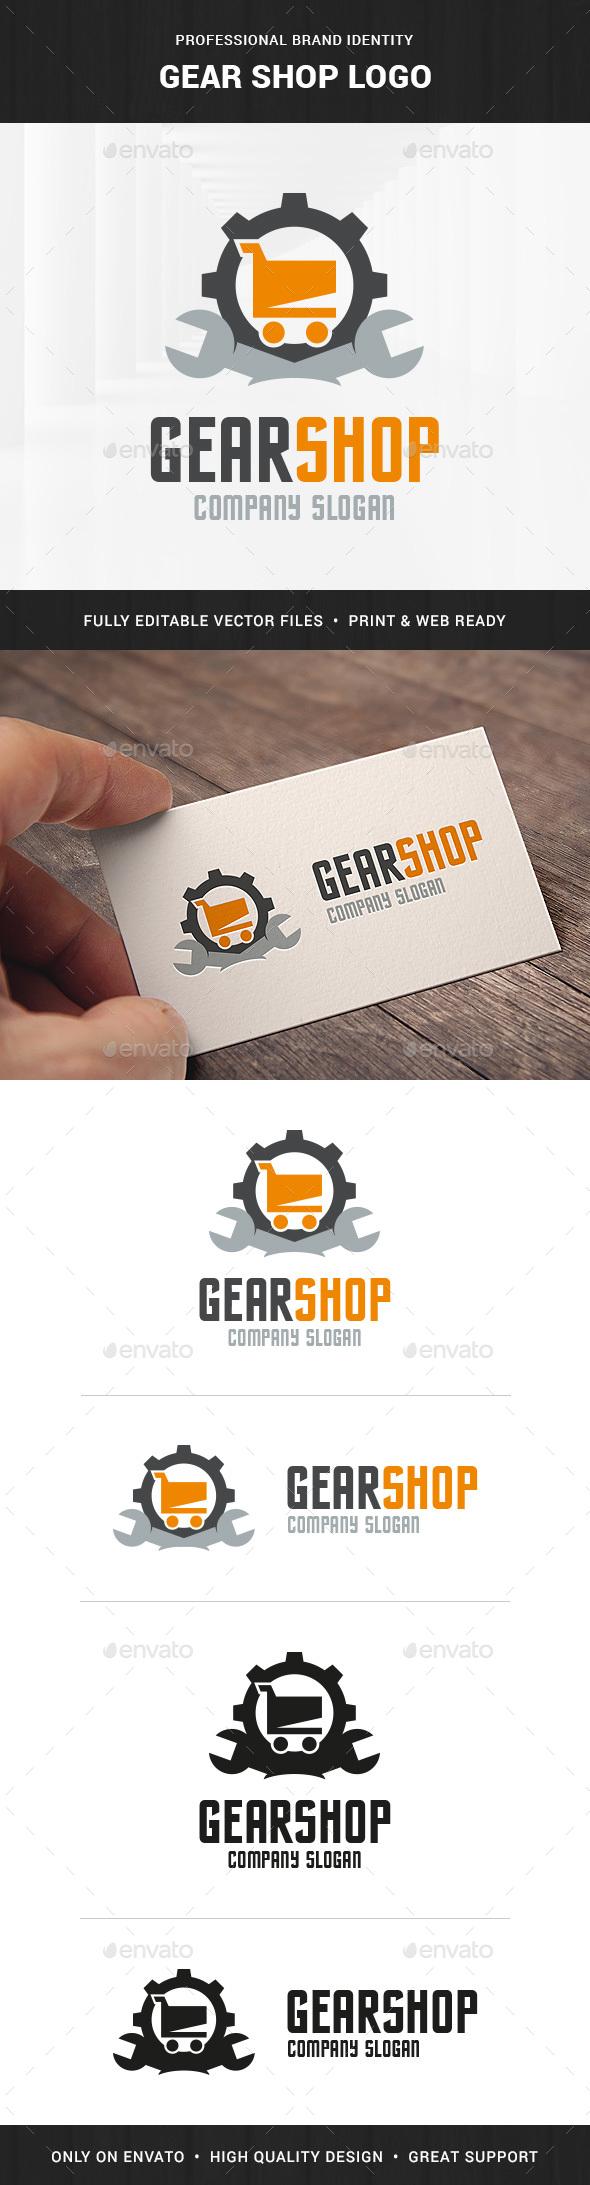 Gear Shop Logo Template